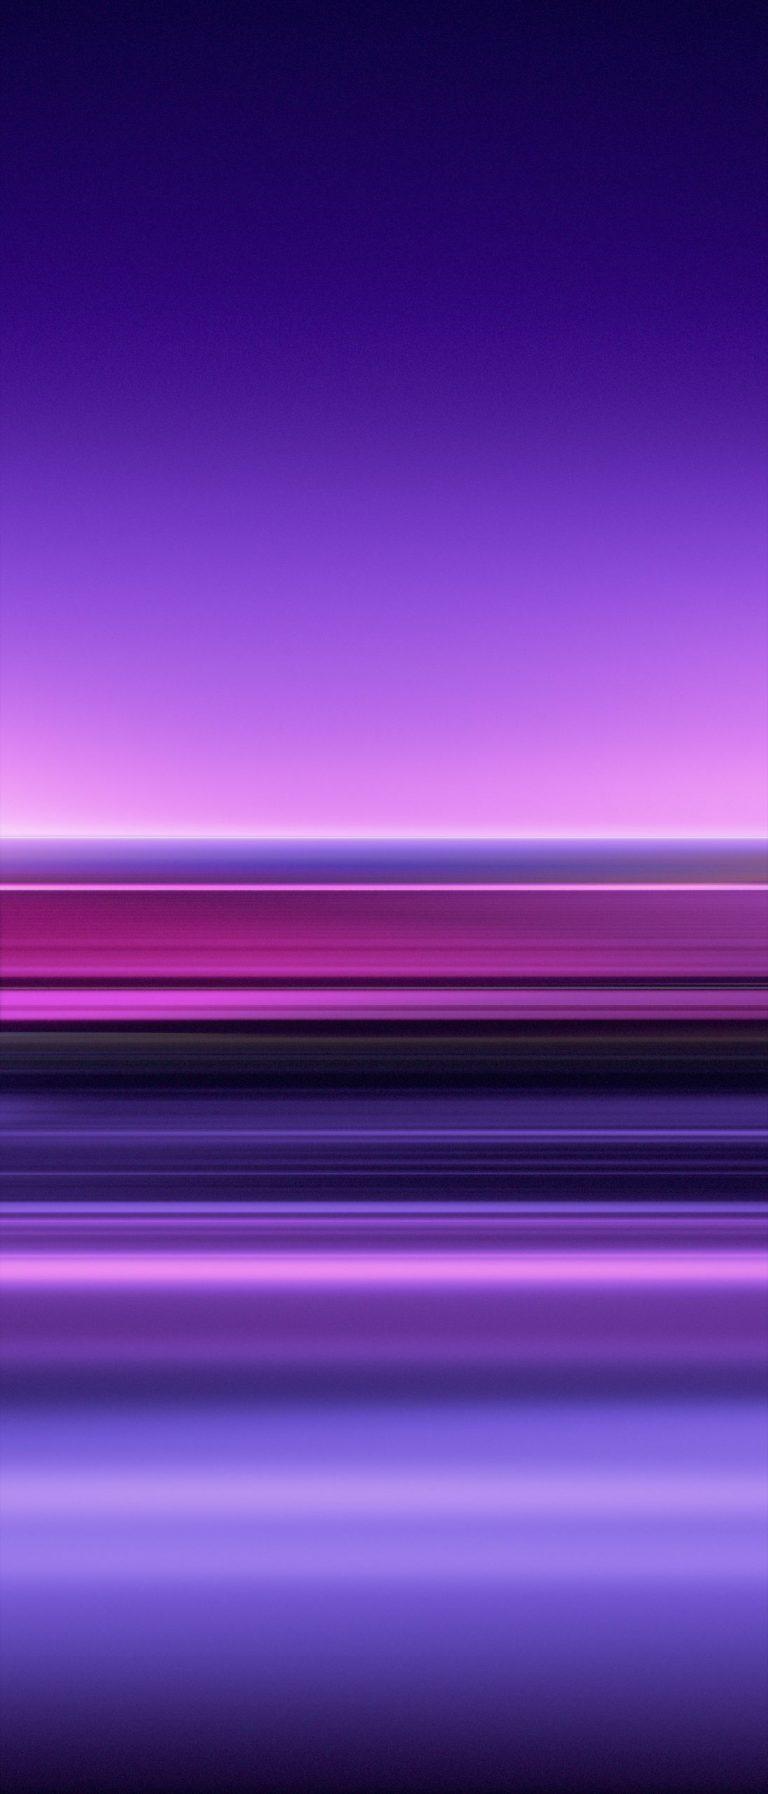 Sony Xperia 1 Stock Wallpaper 04 1096x2560 768x1794